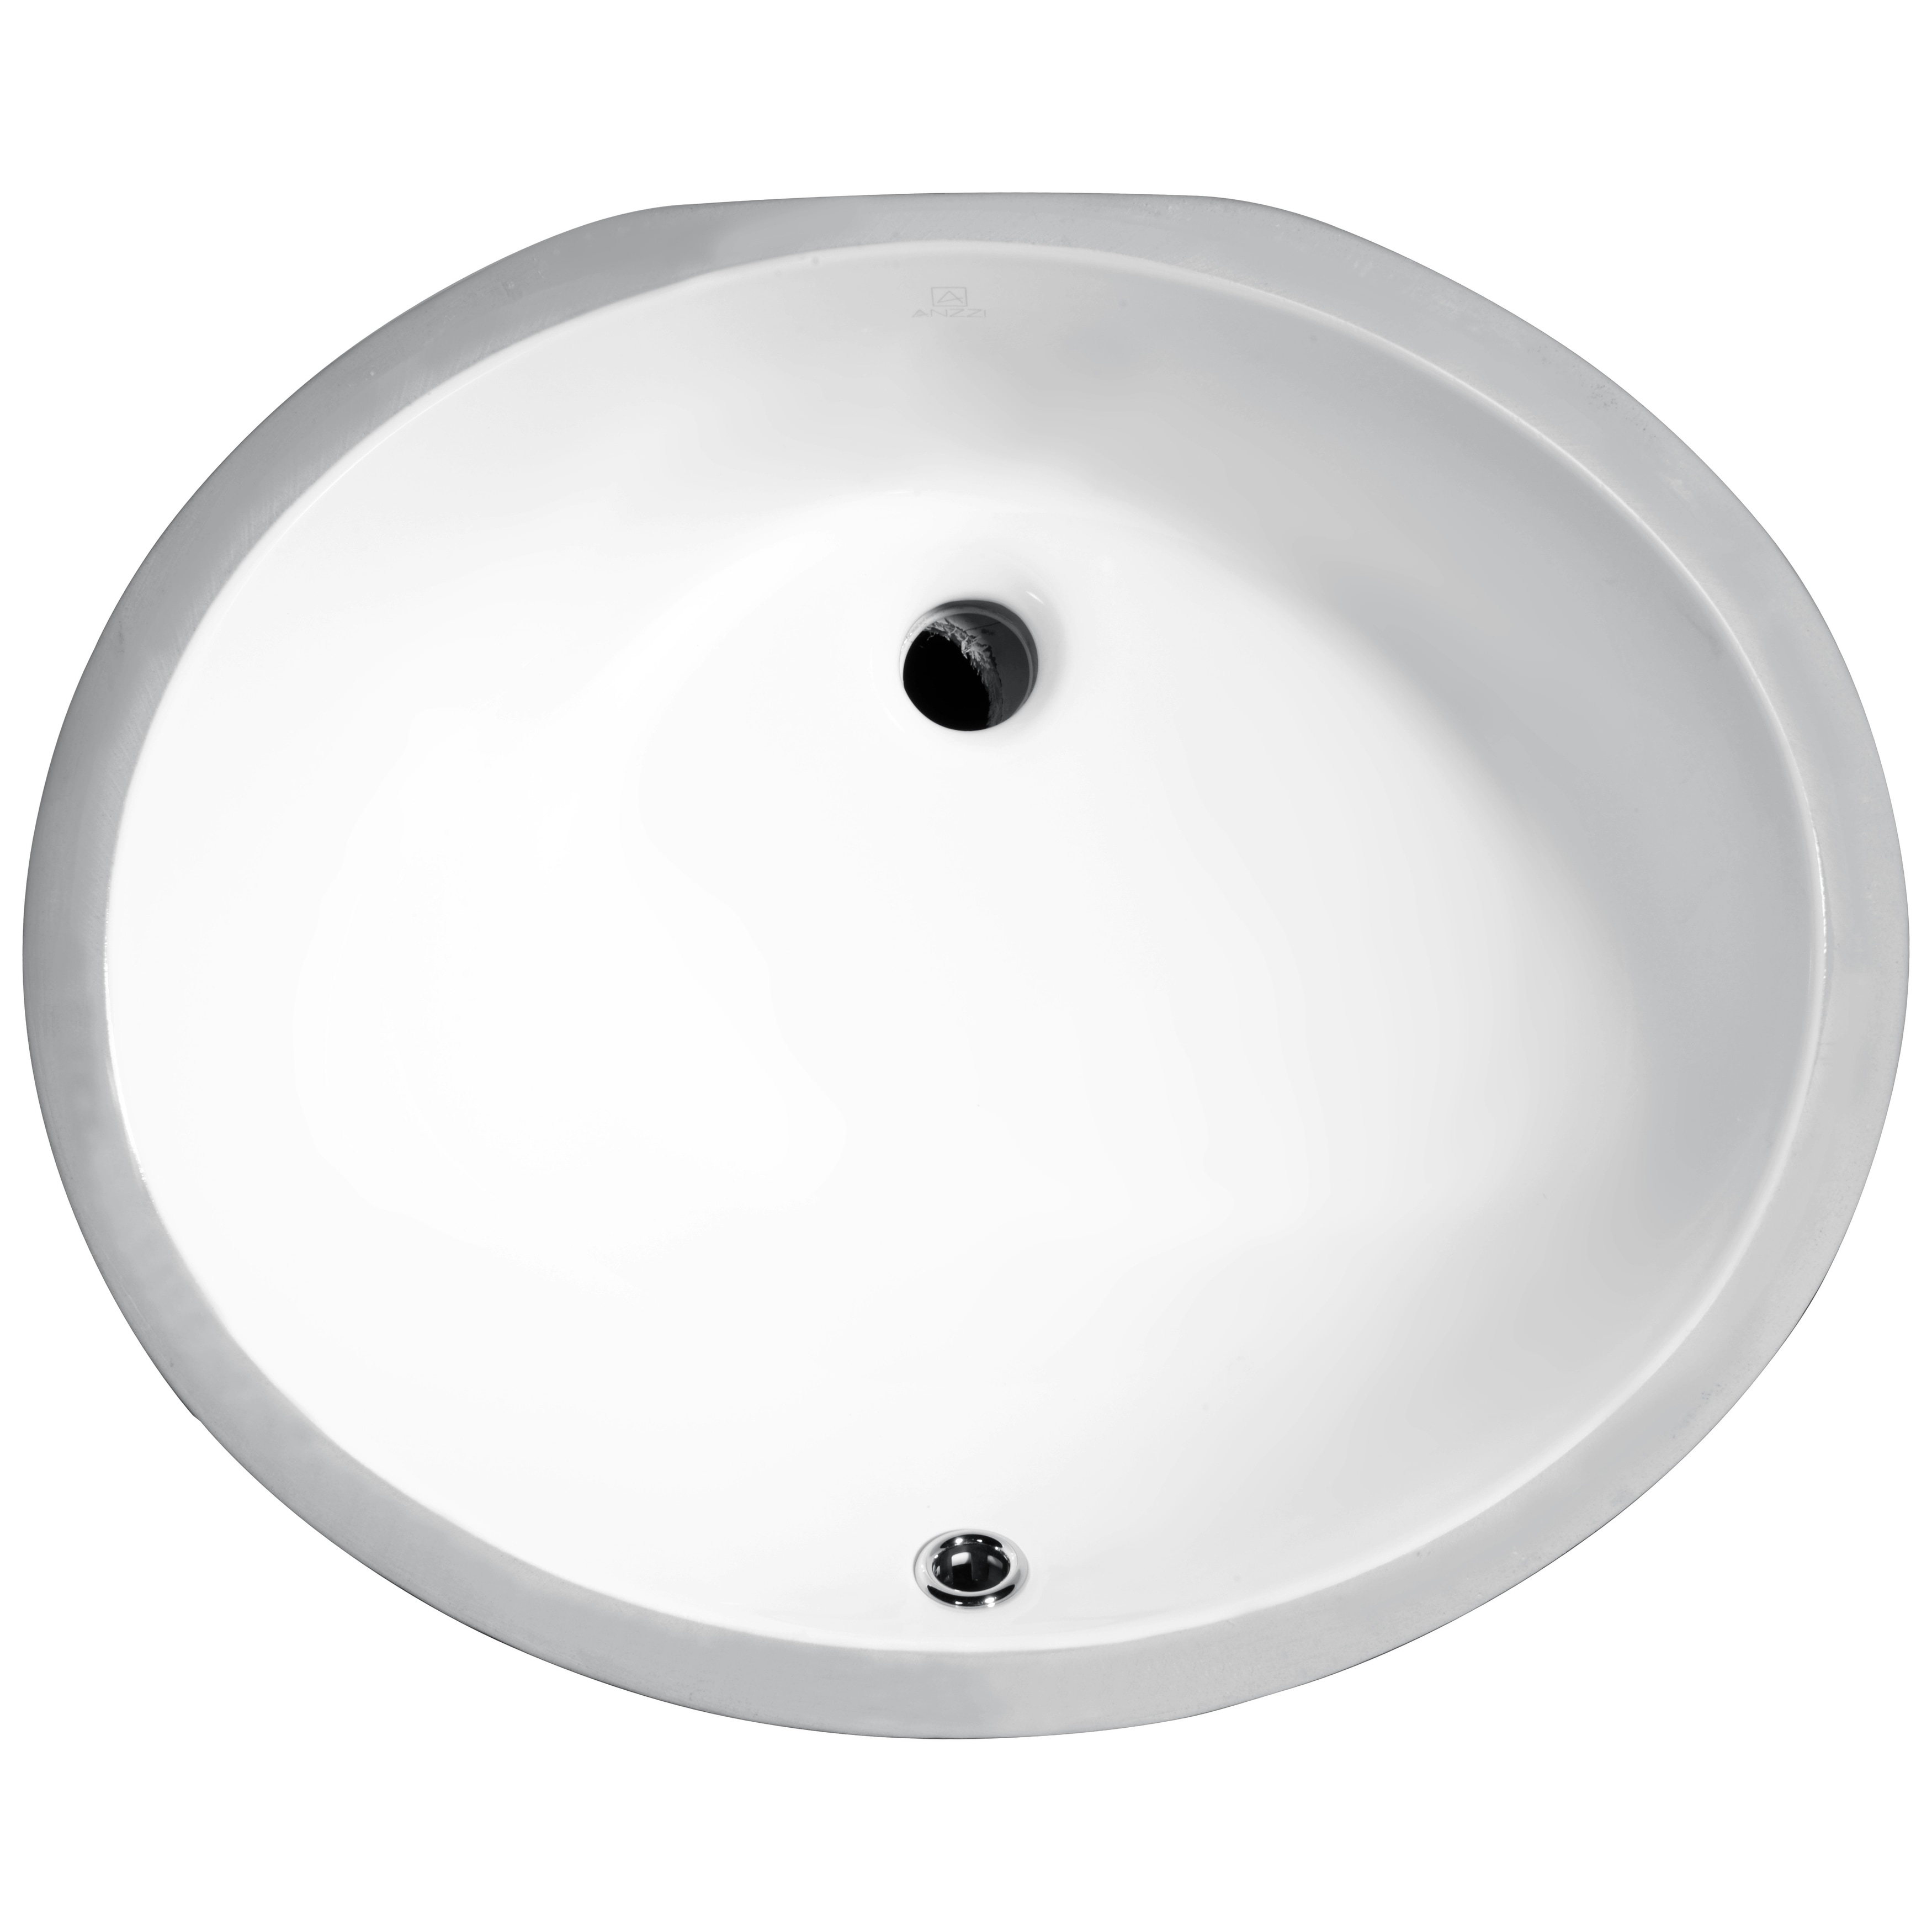 Anzzi Pegasus Series White Ceramic Undermount Basin Bathr...